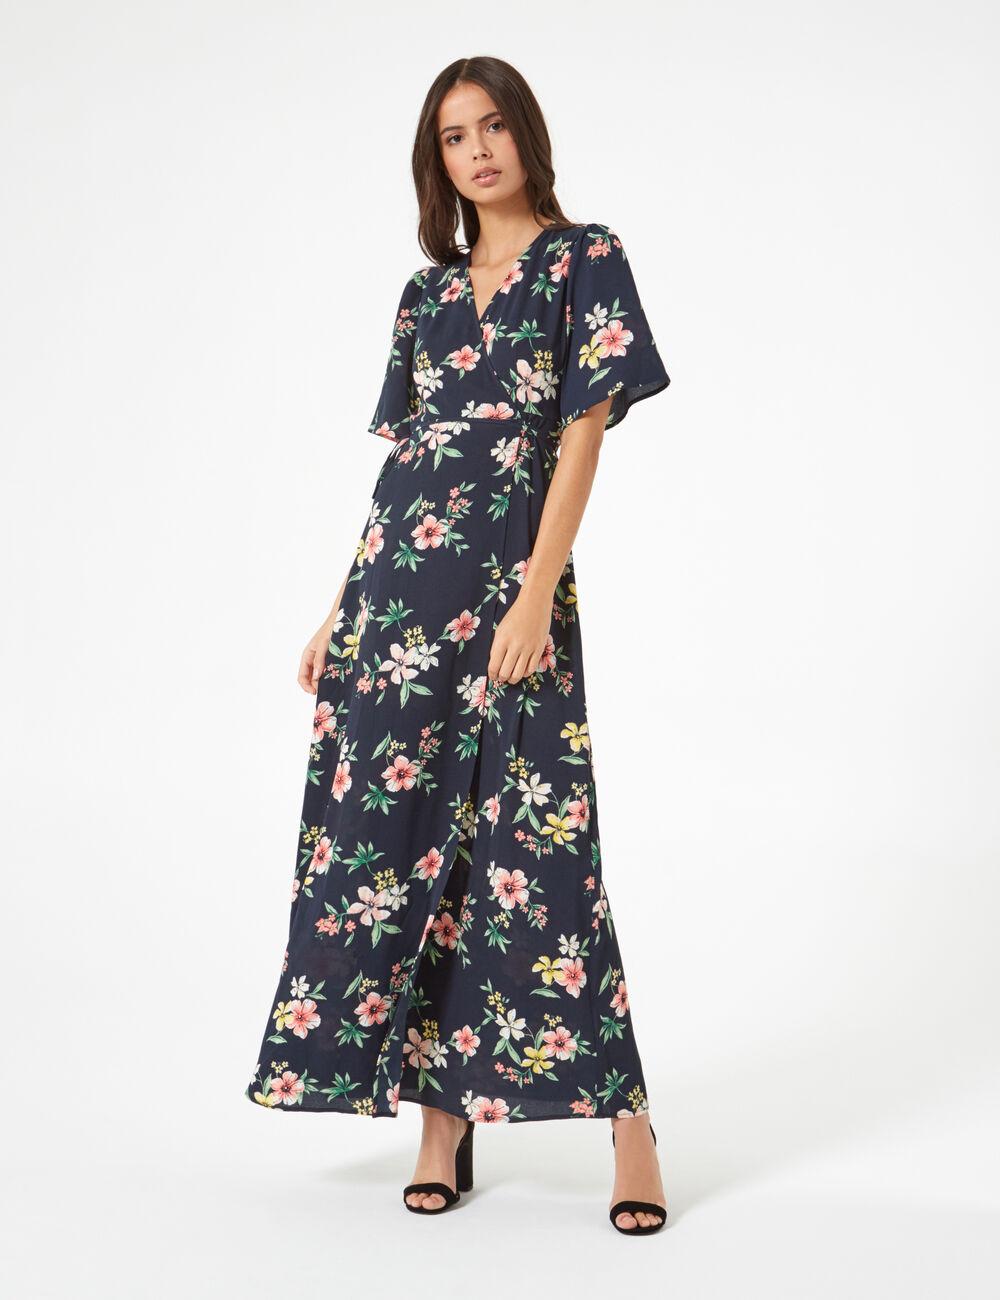 6ef2aca4f23 Robe longue fleurie bleue marine femme • Jennyfer